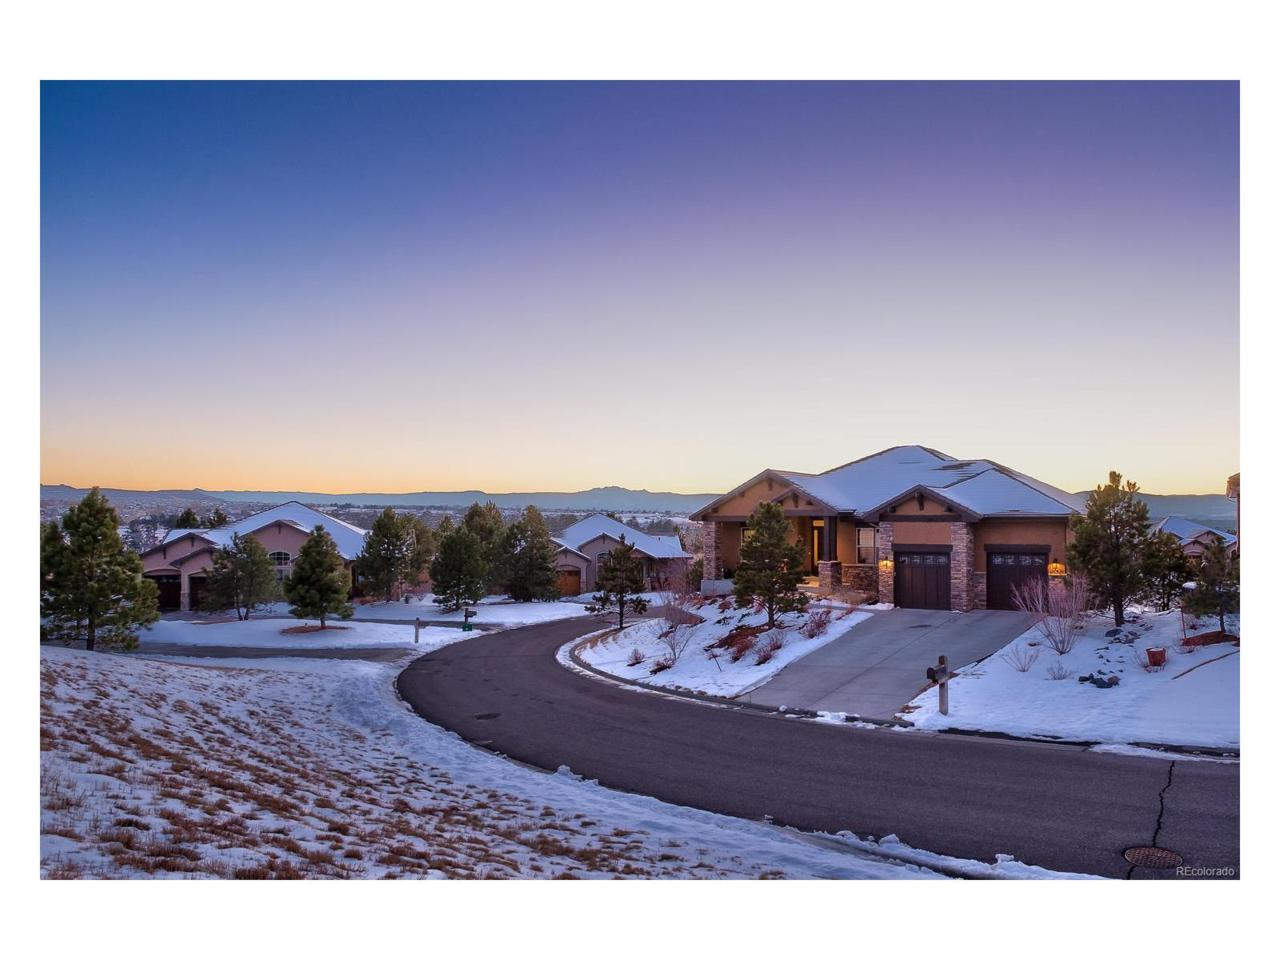 5049 Mcclure Lane, Castle Rock, CO 80108 (#5062303) :: The Peak Properties Group